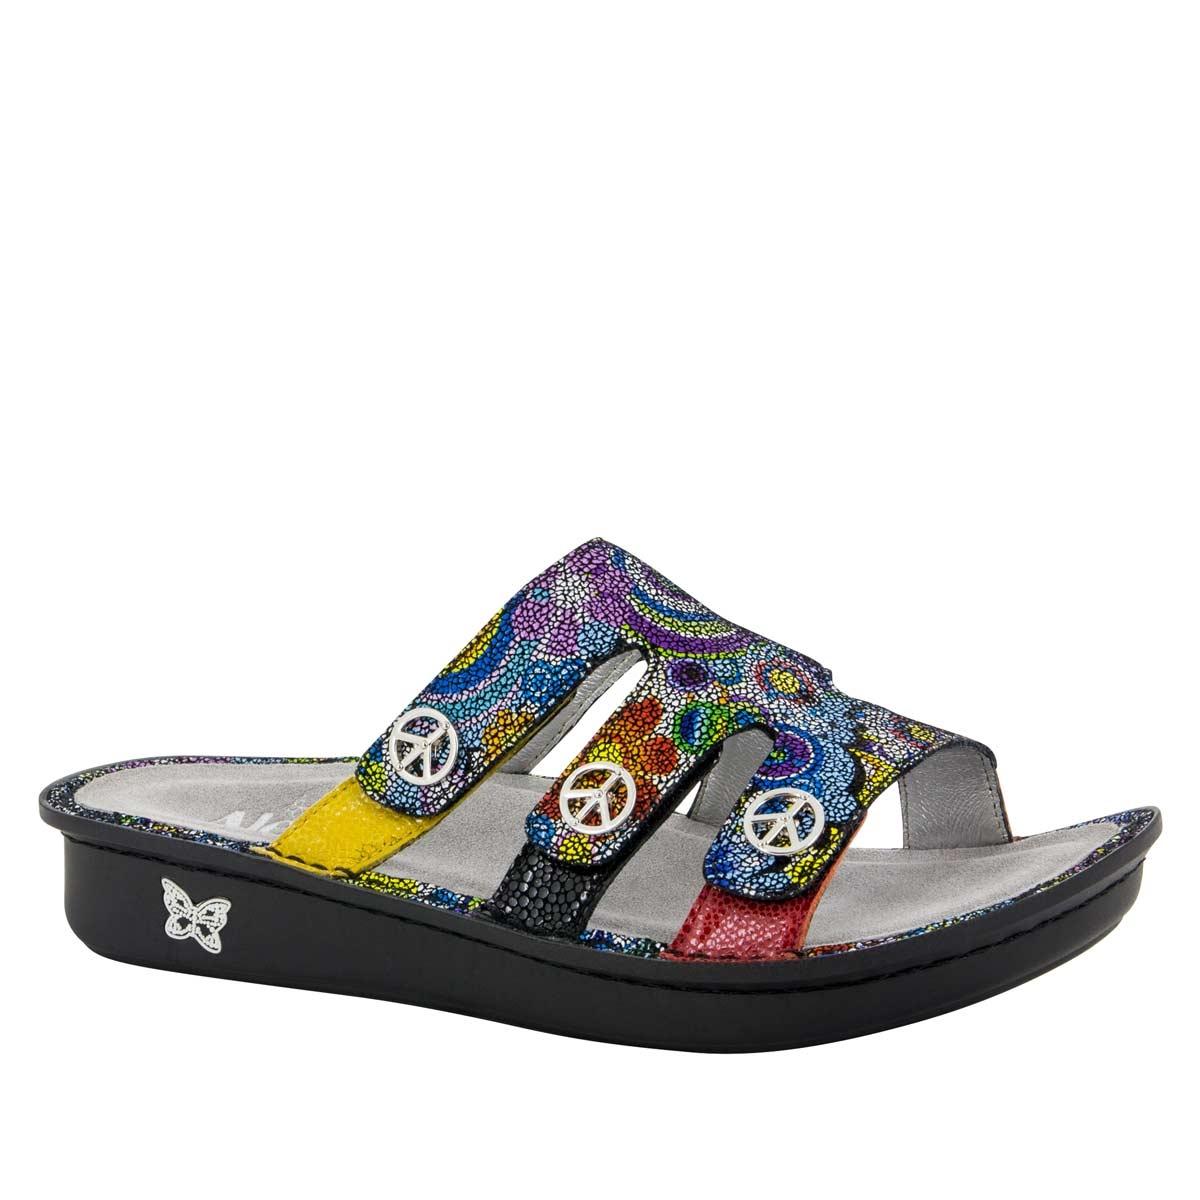 Alegria Venice Hippie Chic Dottie Sandals Shop Alegria